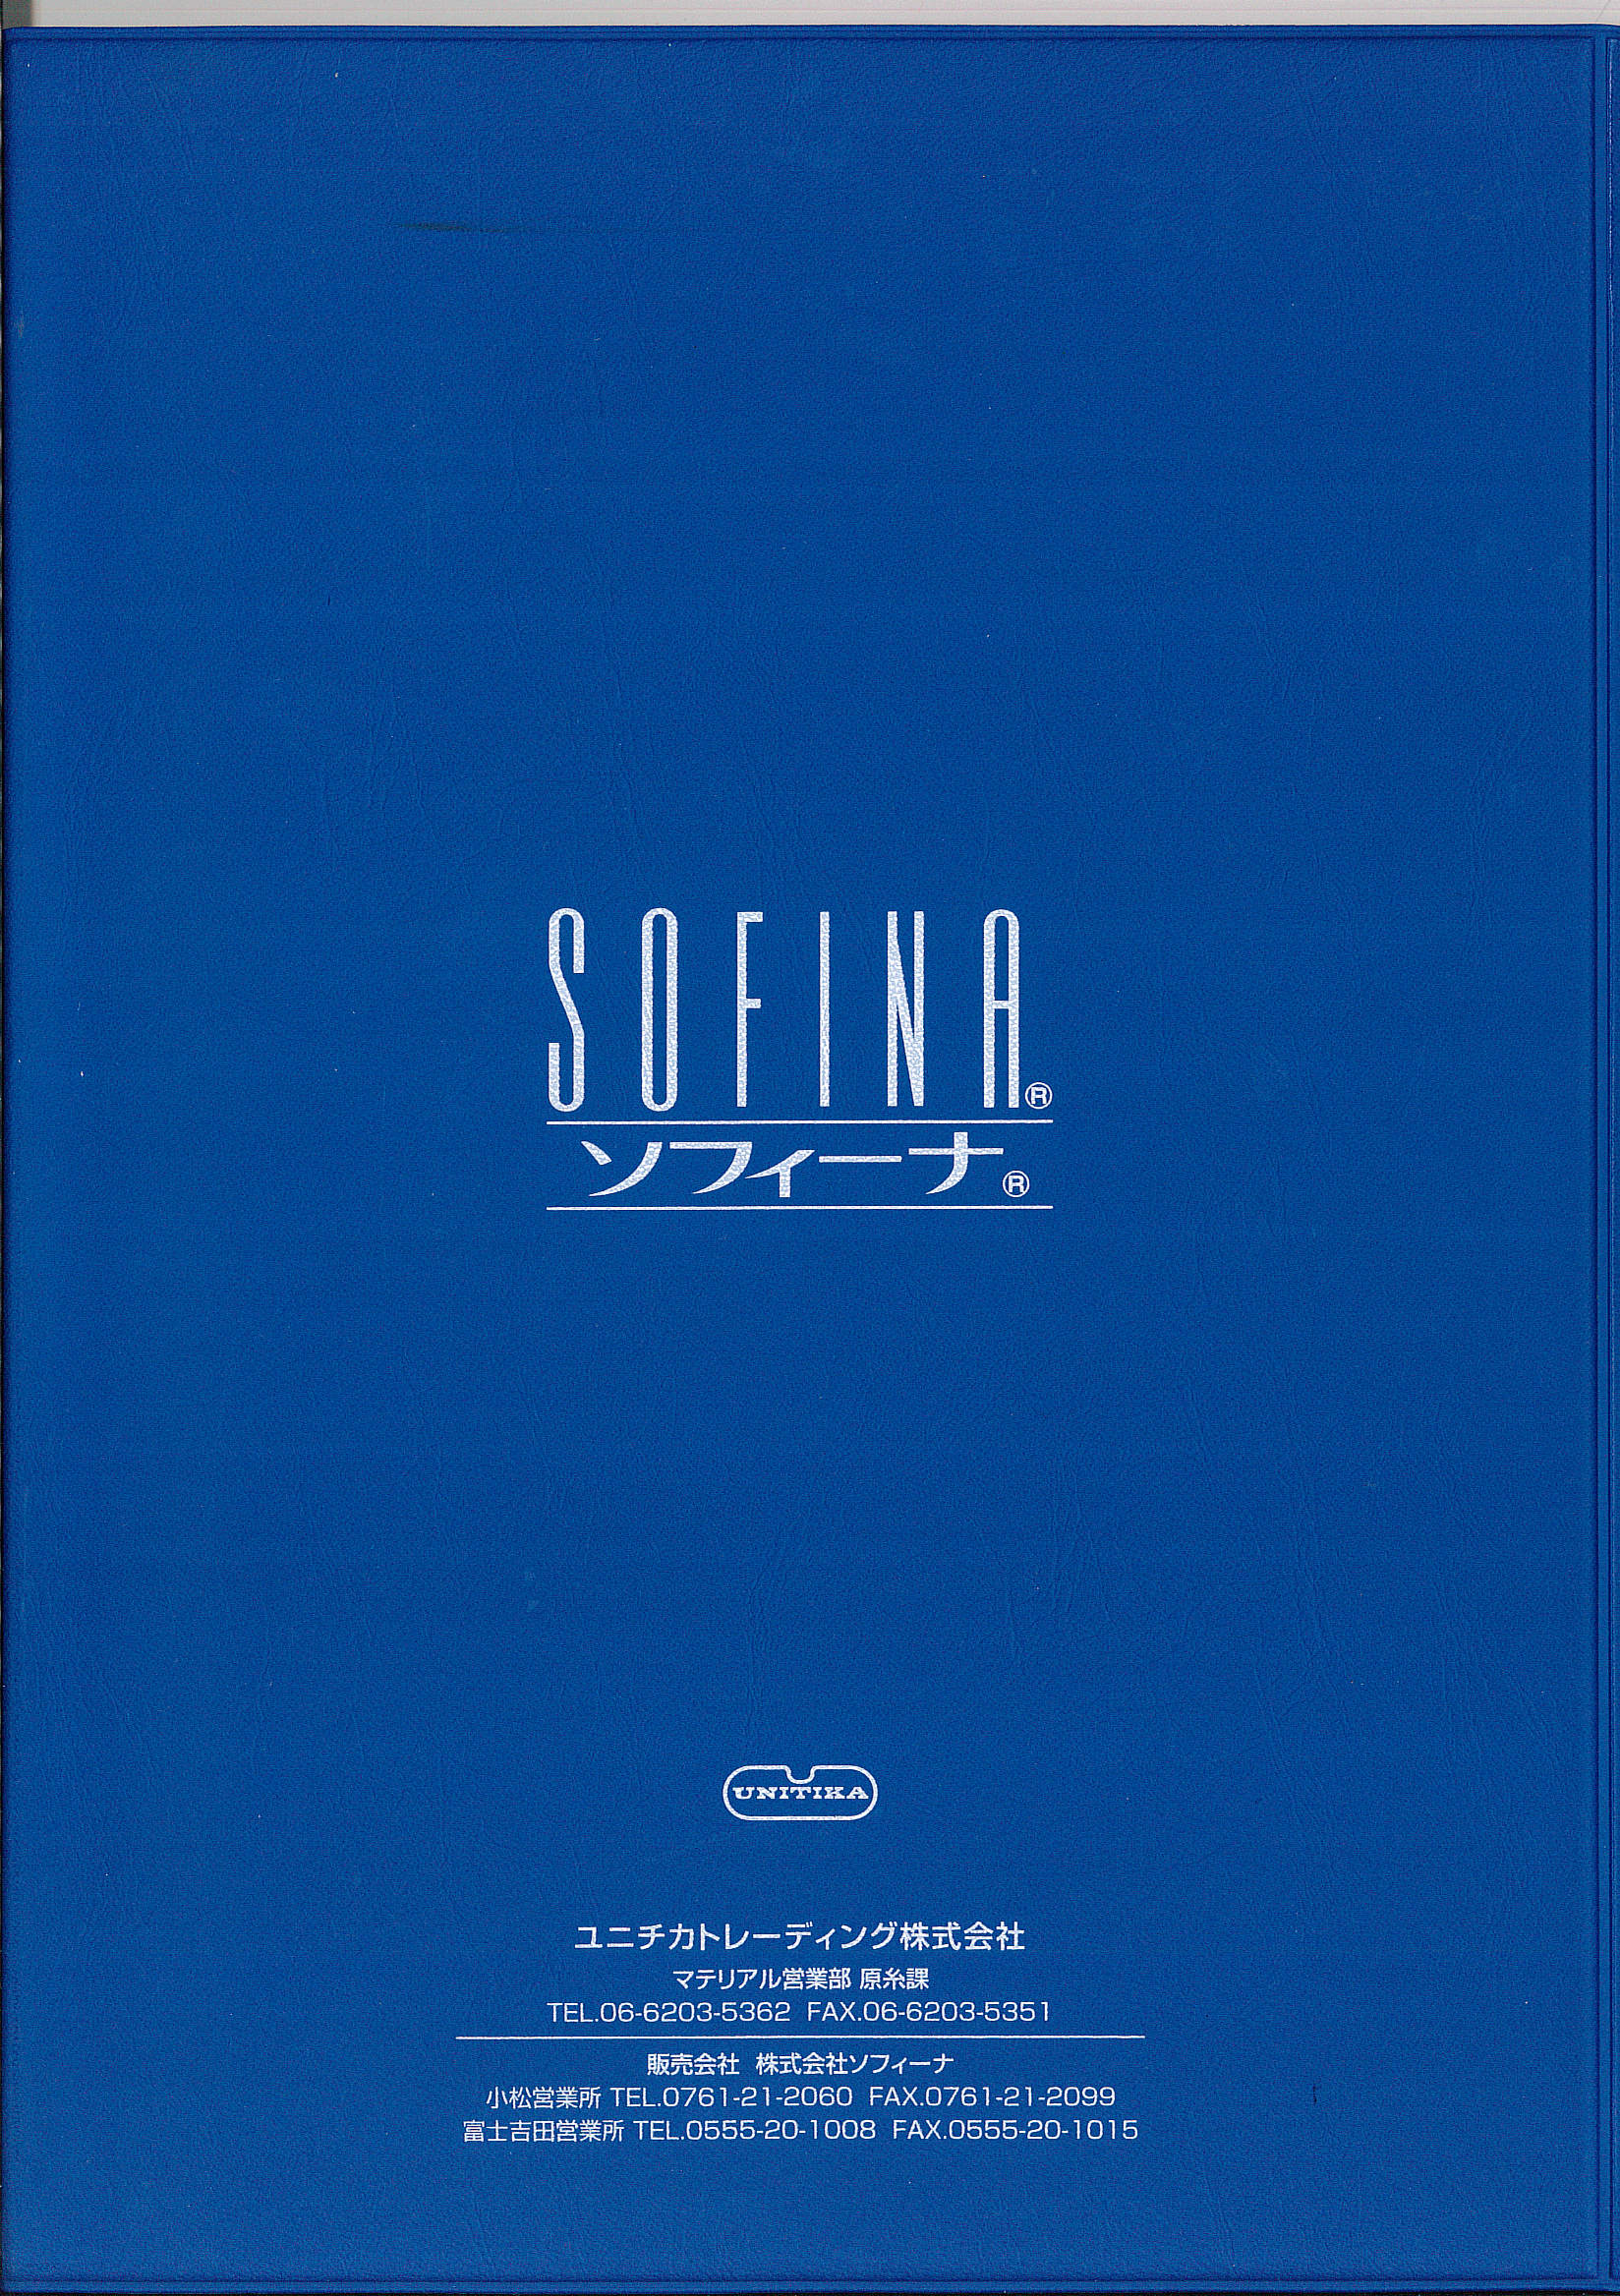 sofina7